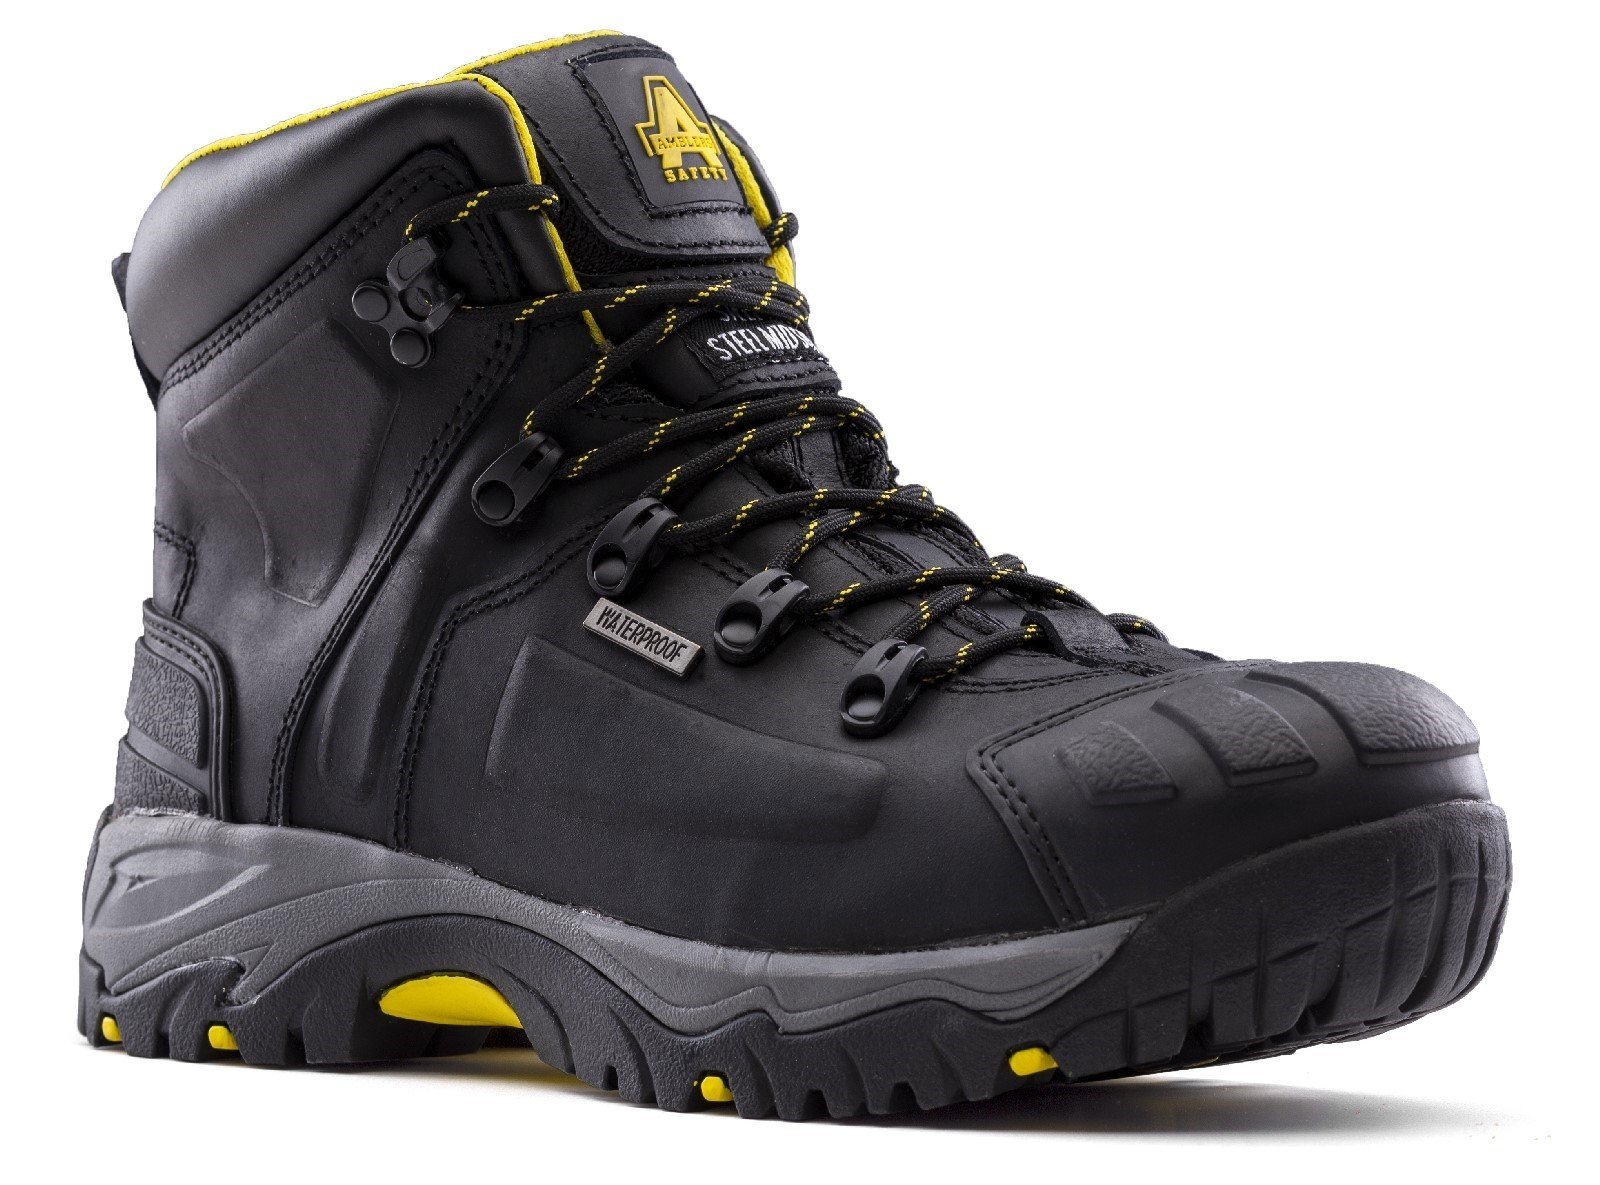 Amblers Unisex Safety Waterproof Wide Fit Boot Black 29416 - Black 7